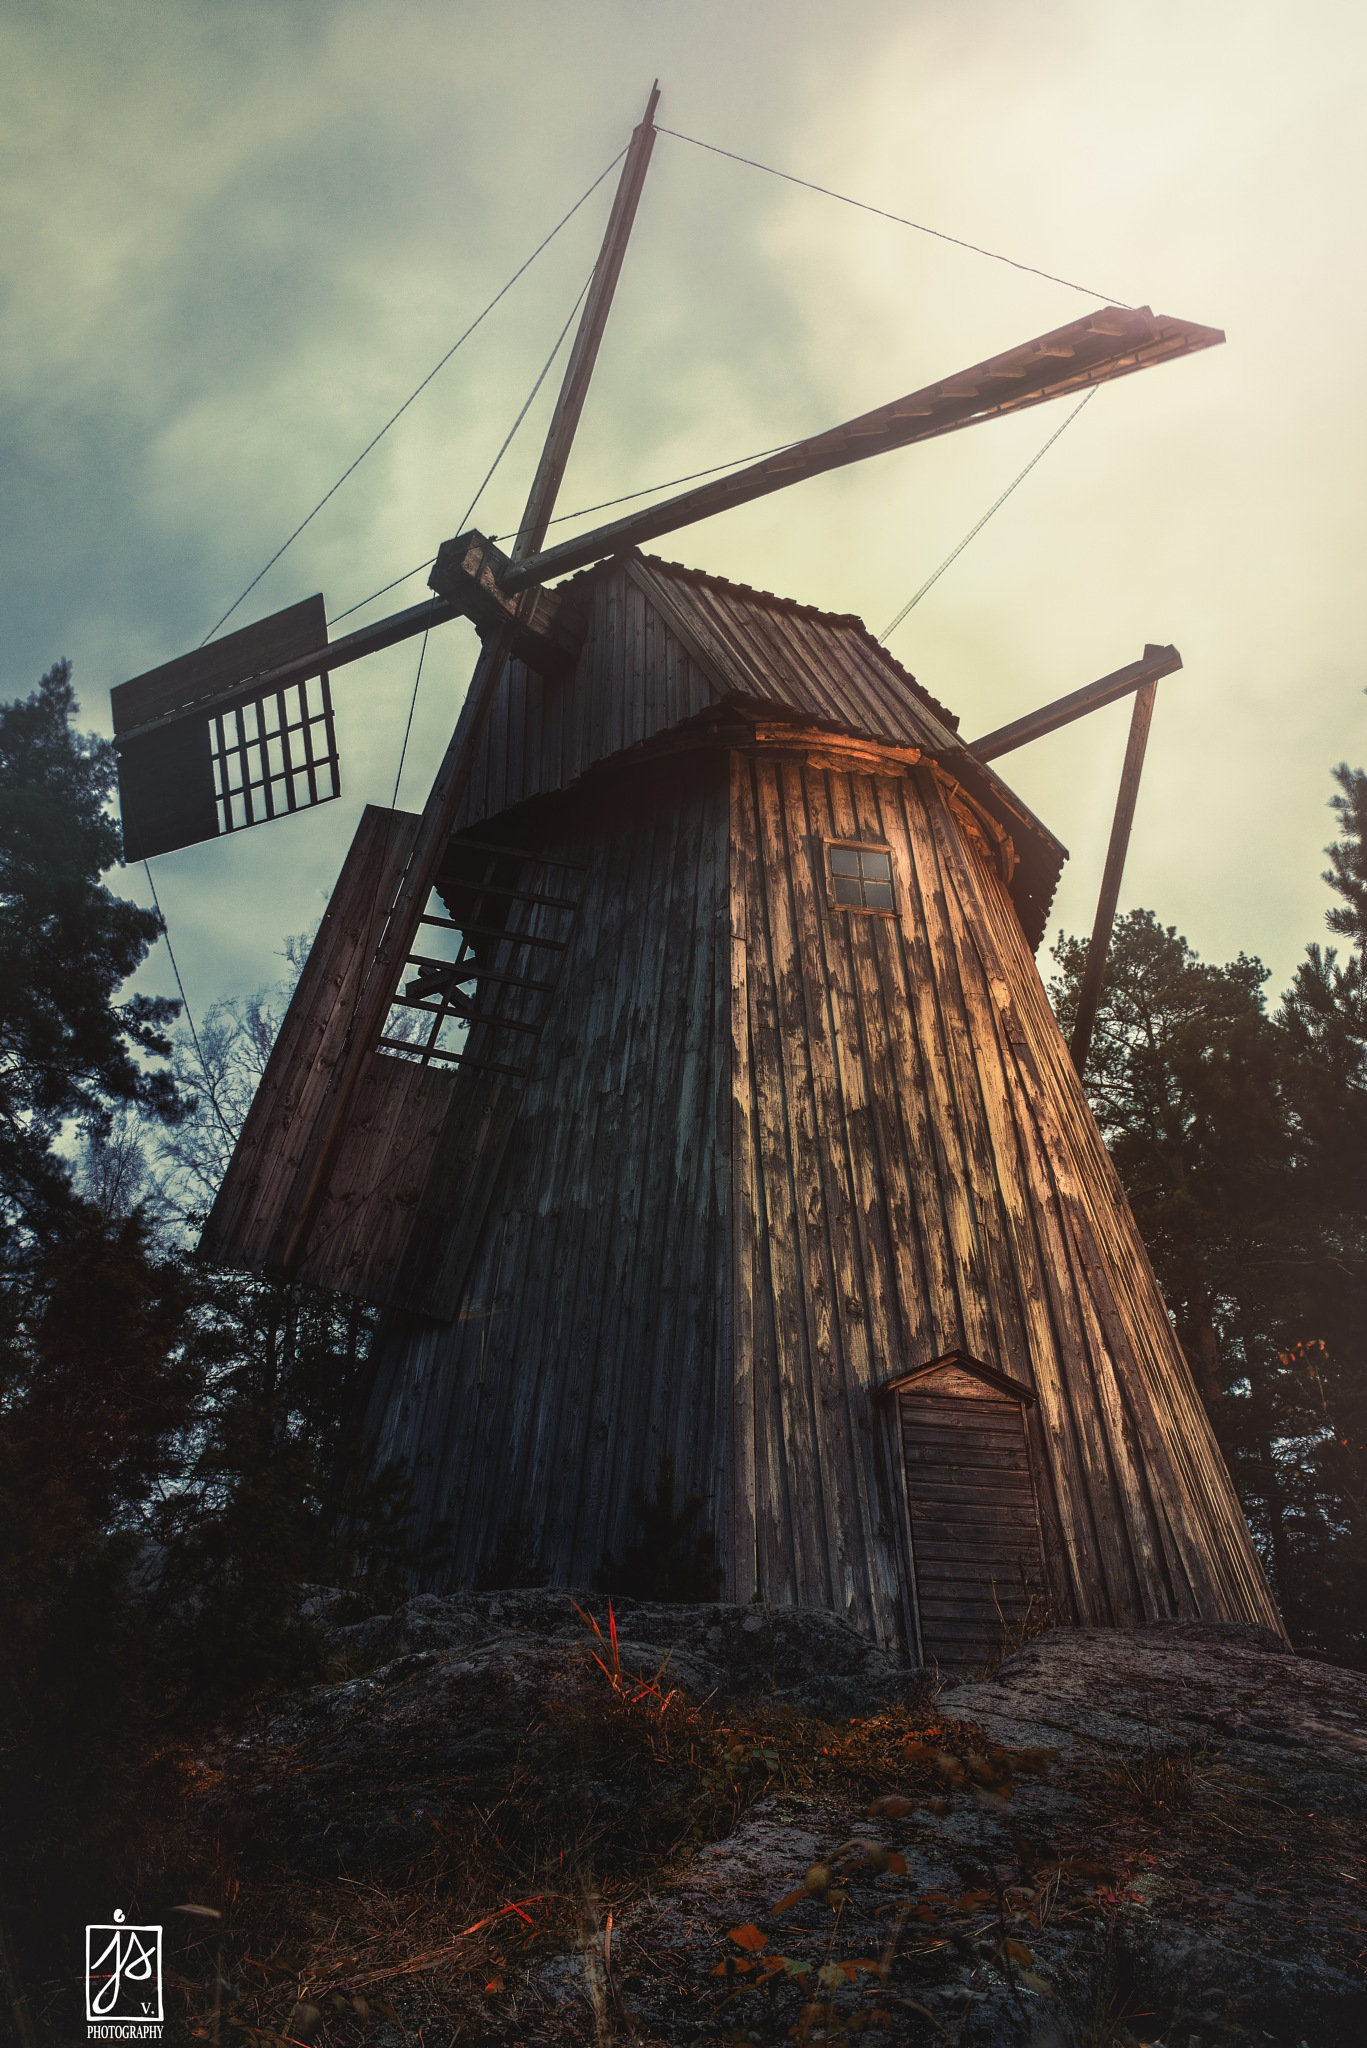 Windmill by Juhamatti Vahdersalo